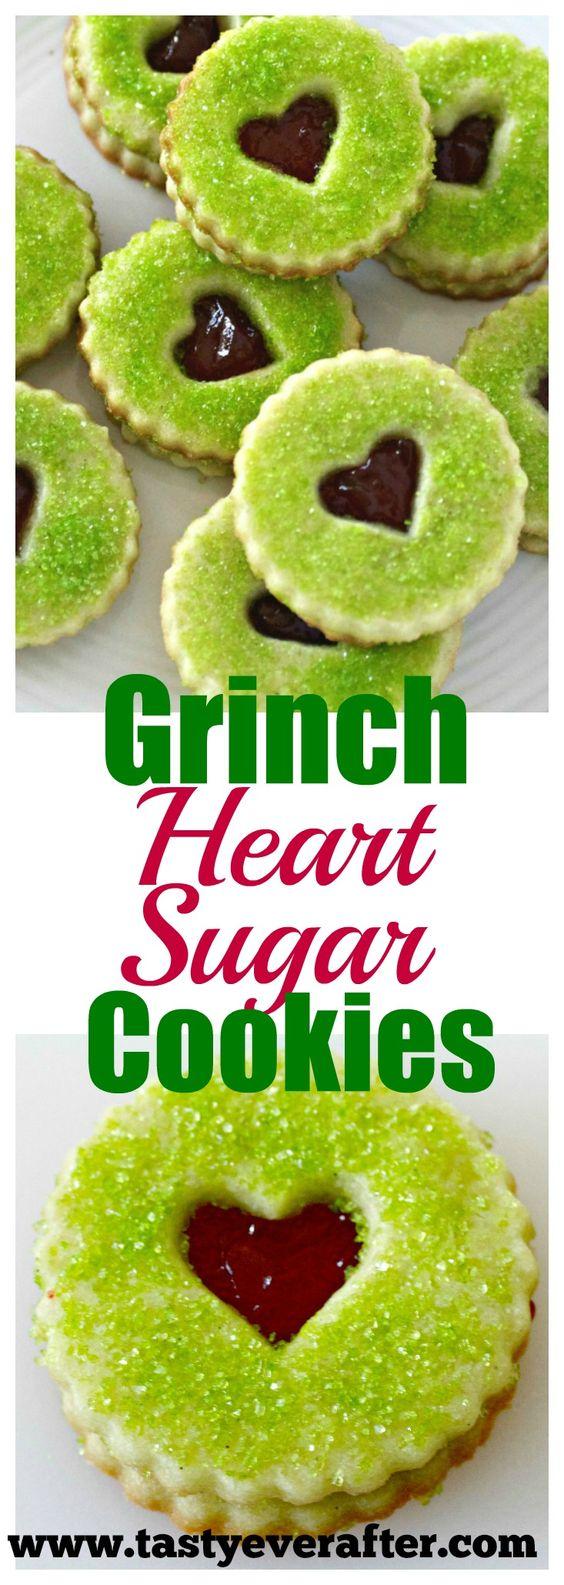 Yummy Grinch Heart Raspberry Filled Sugar Cookies